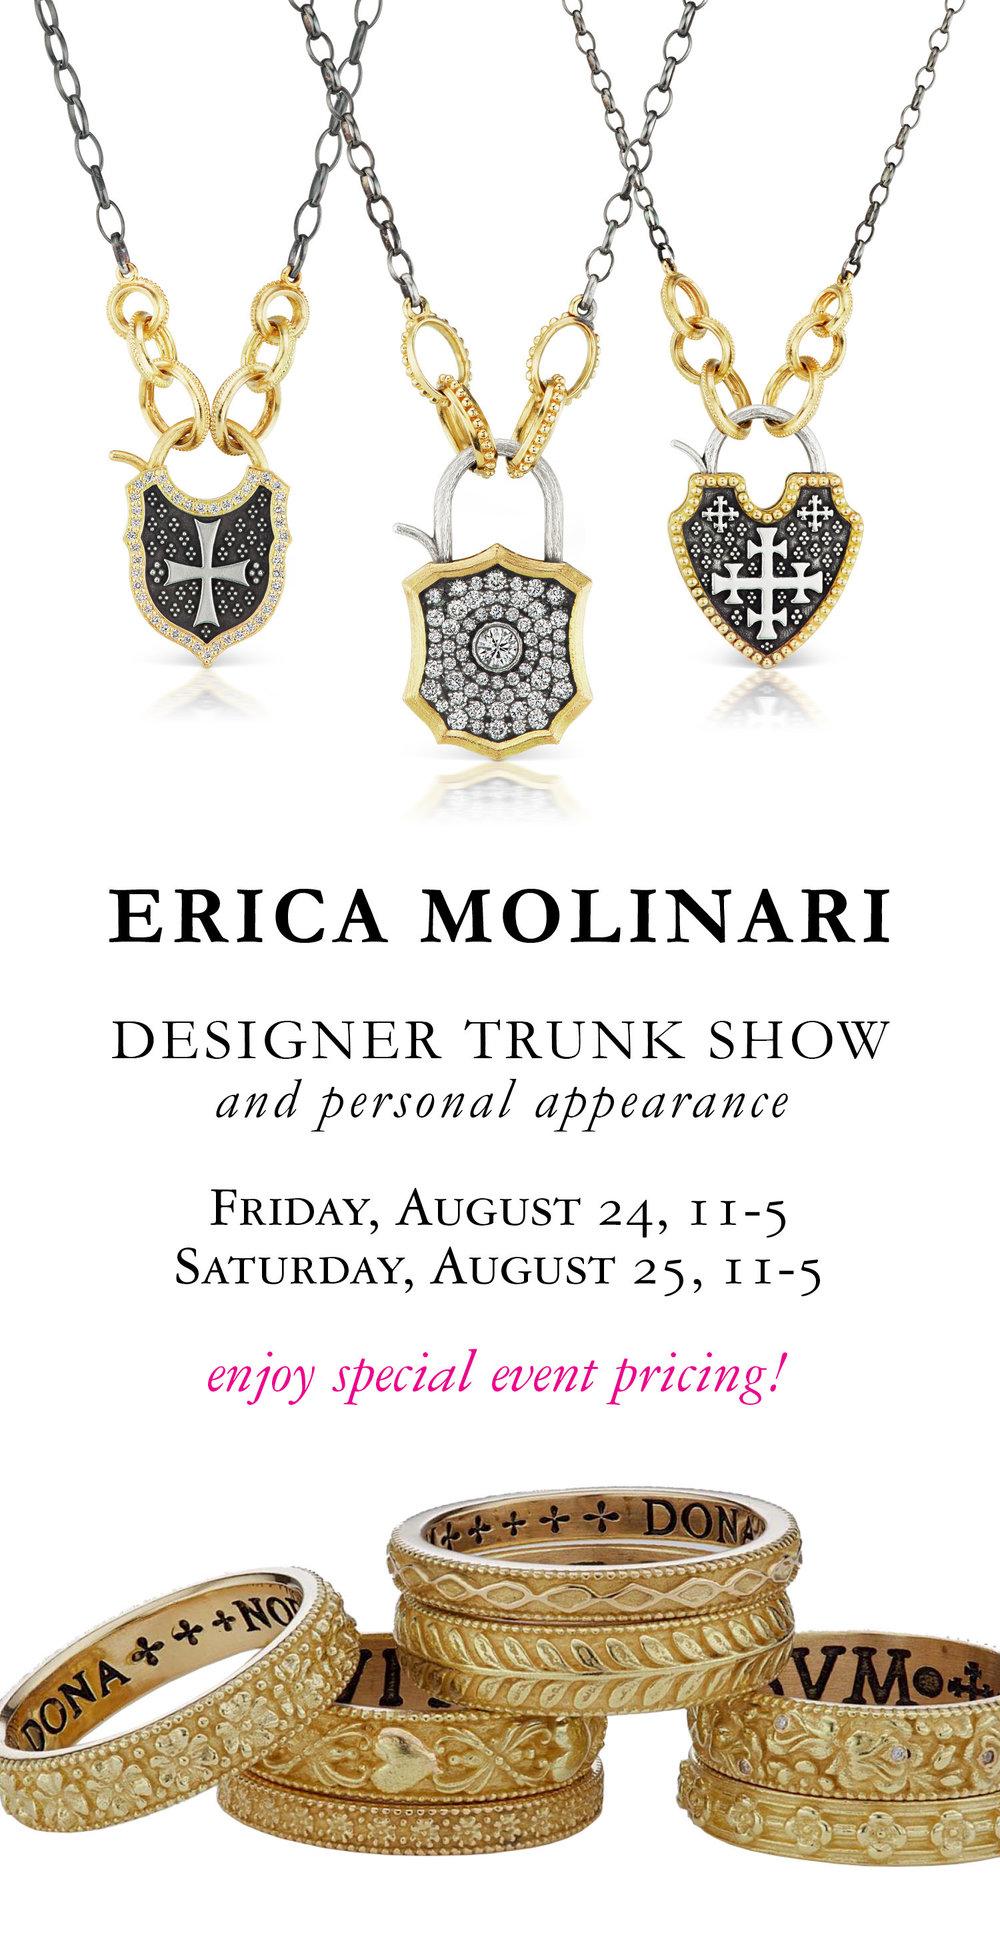 Erica Molinari Trunk Show Summer 2018 Event.jpg